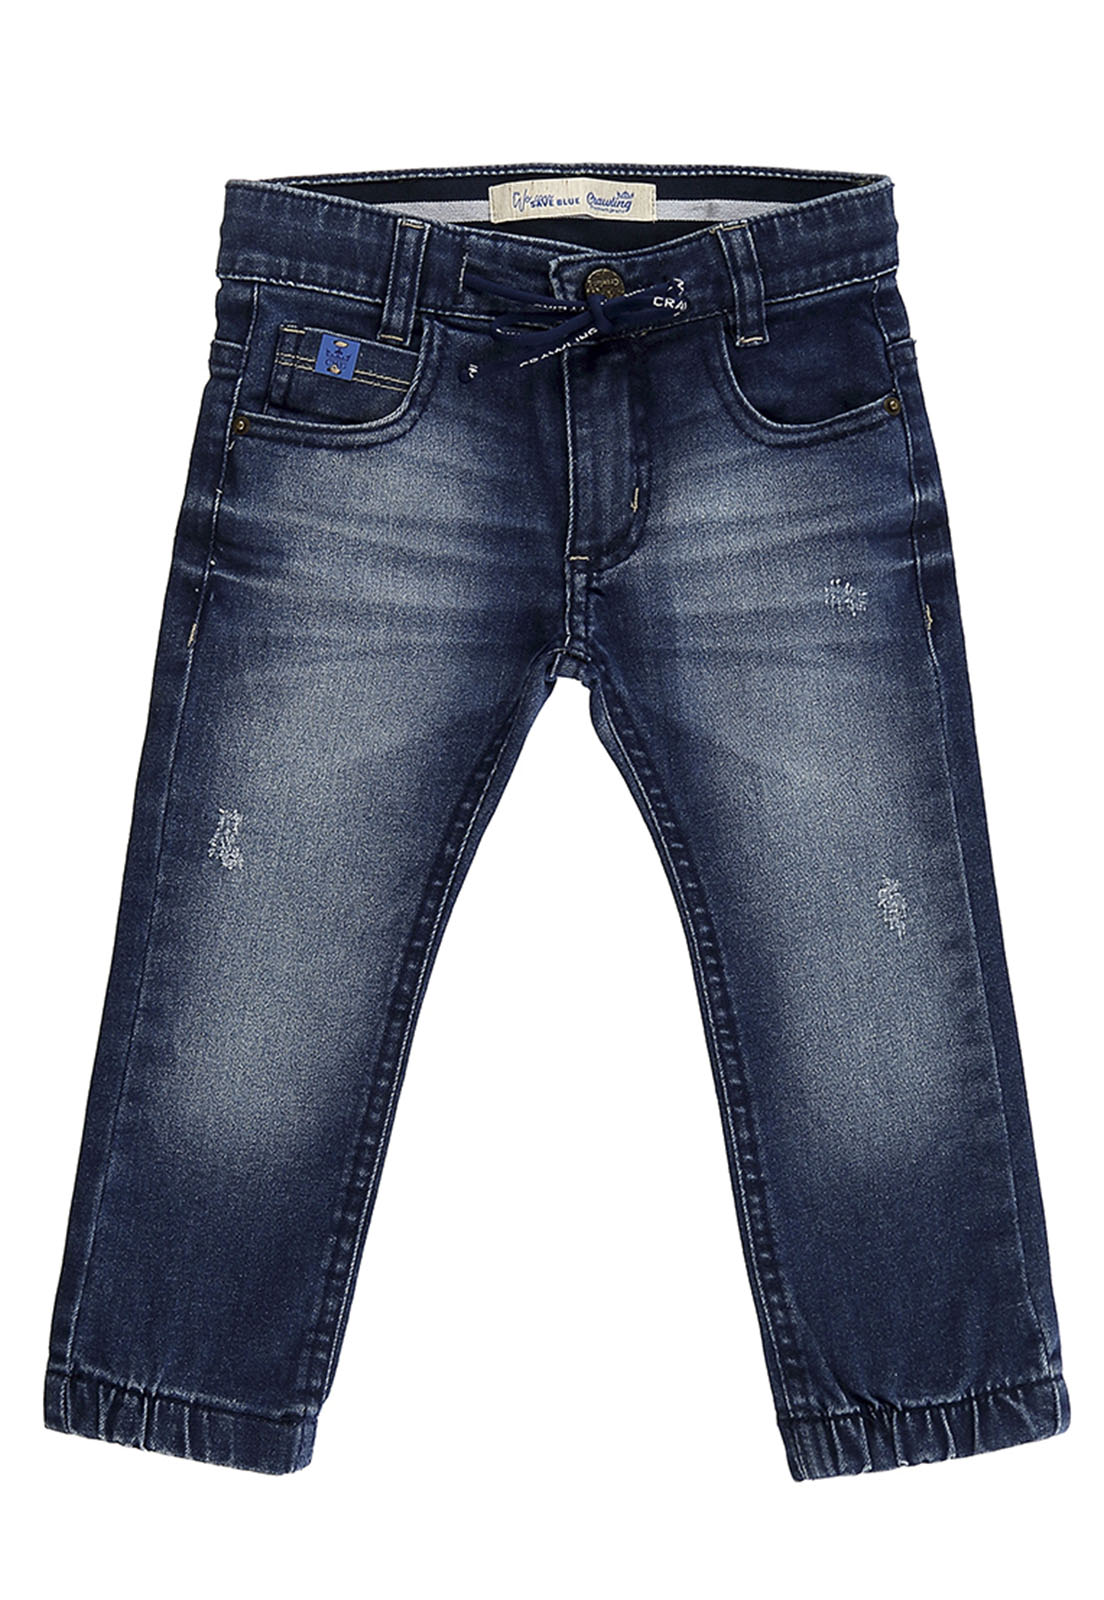 Calça Masculina Jogger Crawling  Jeans